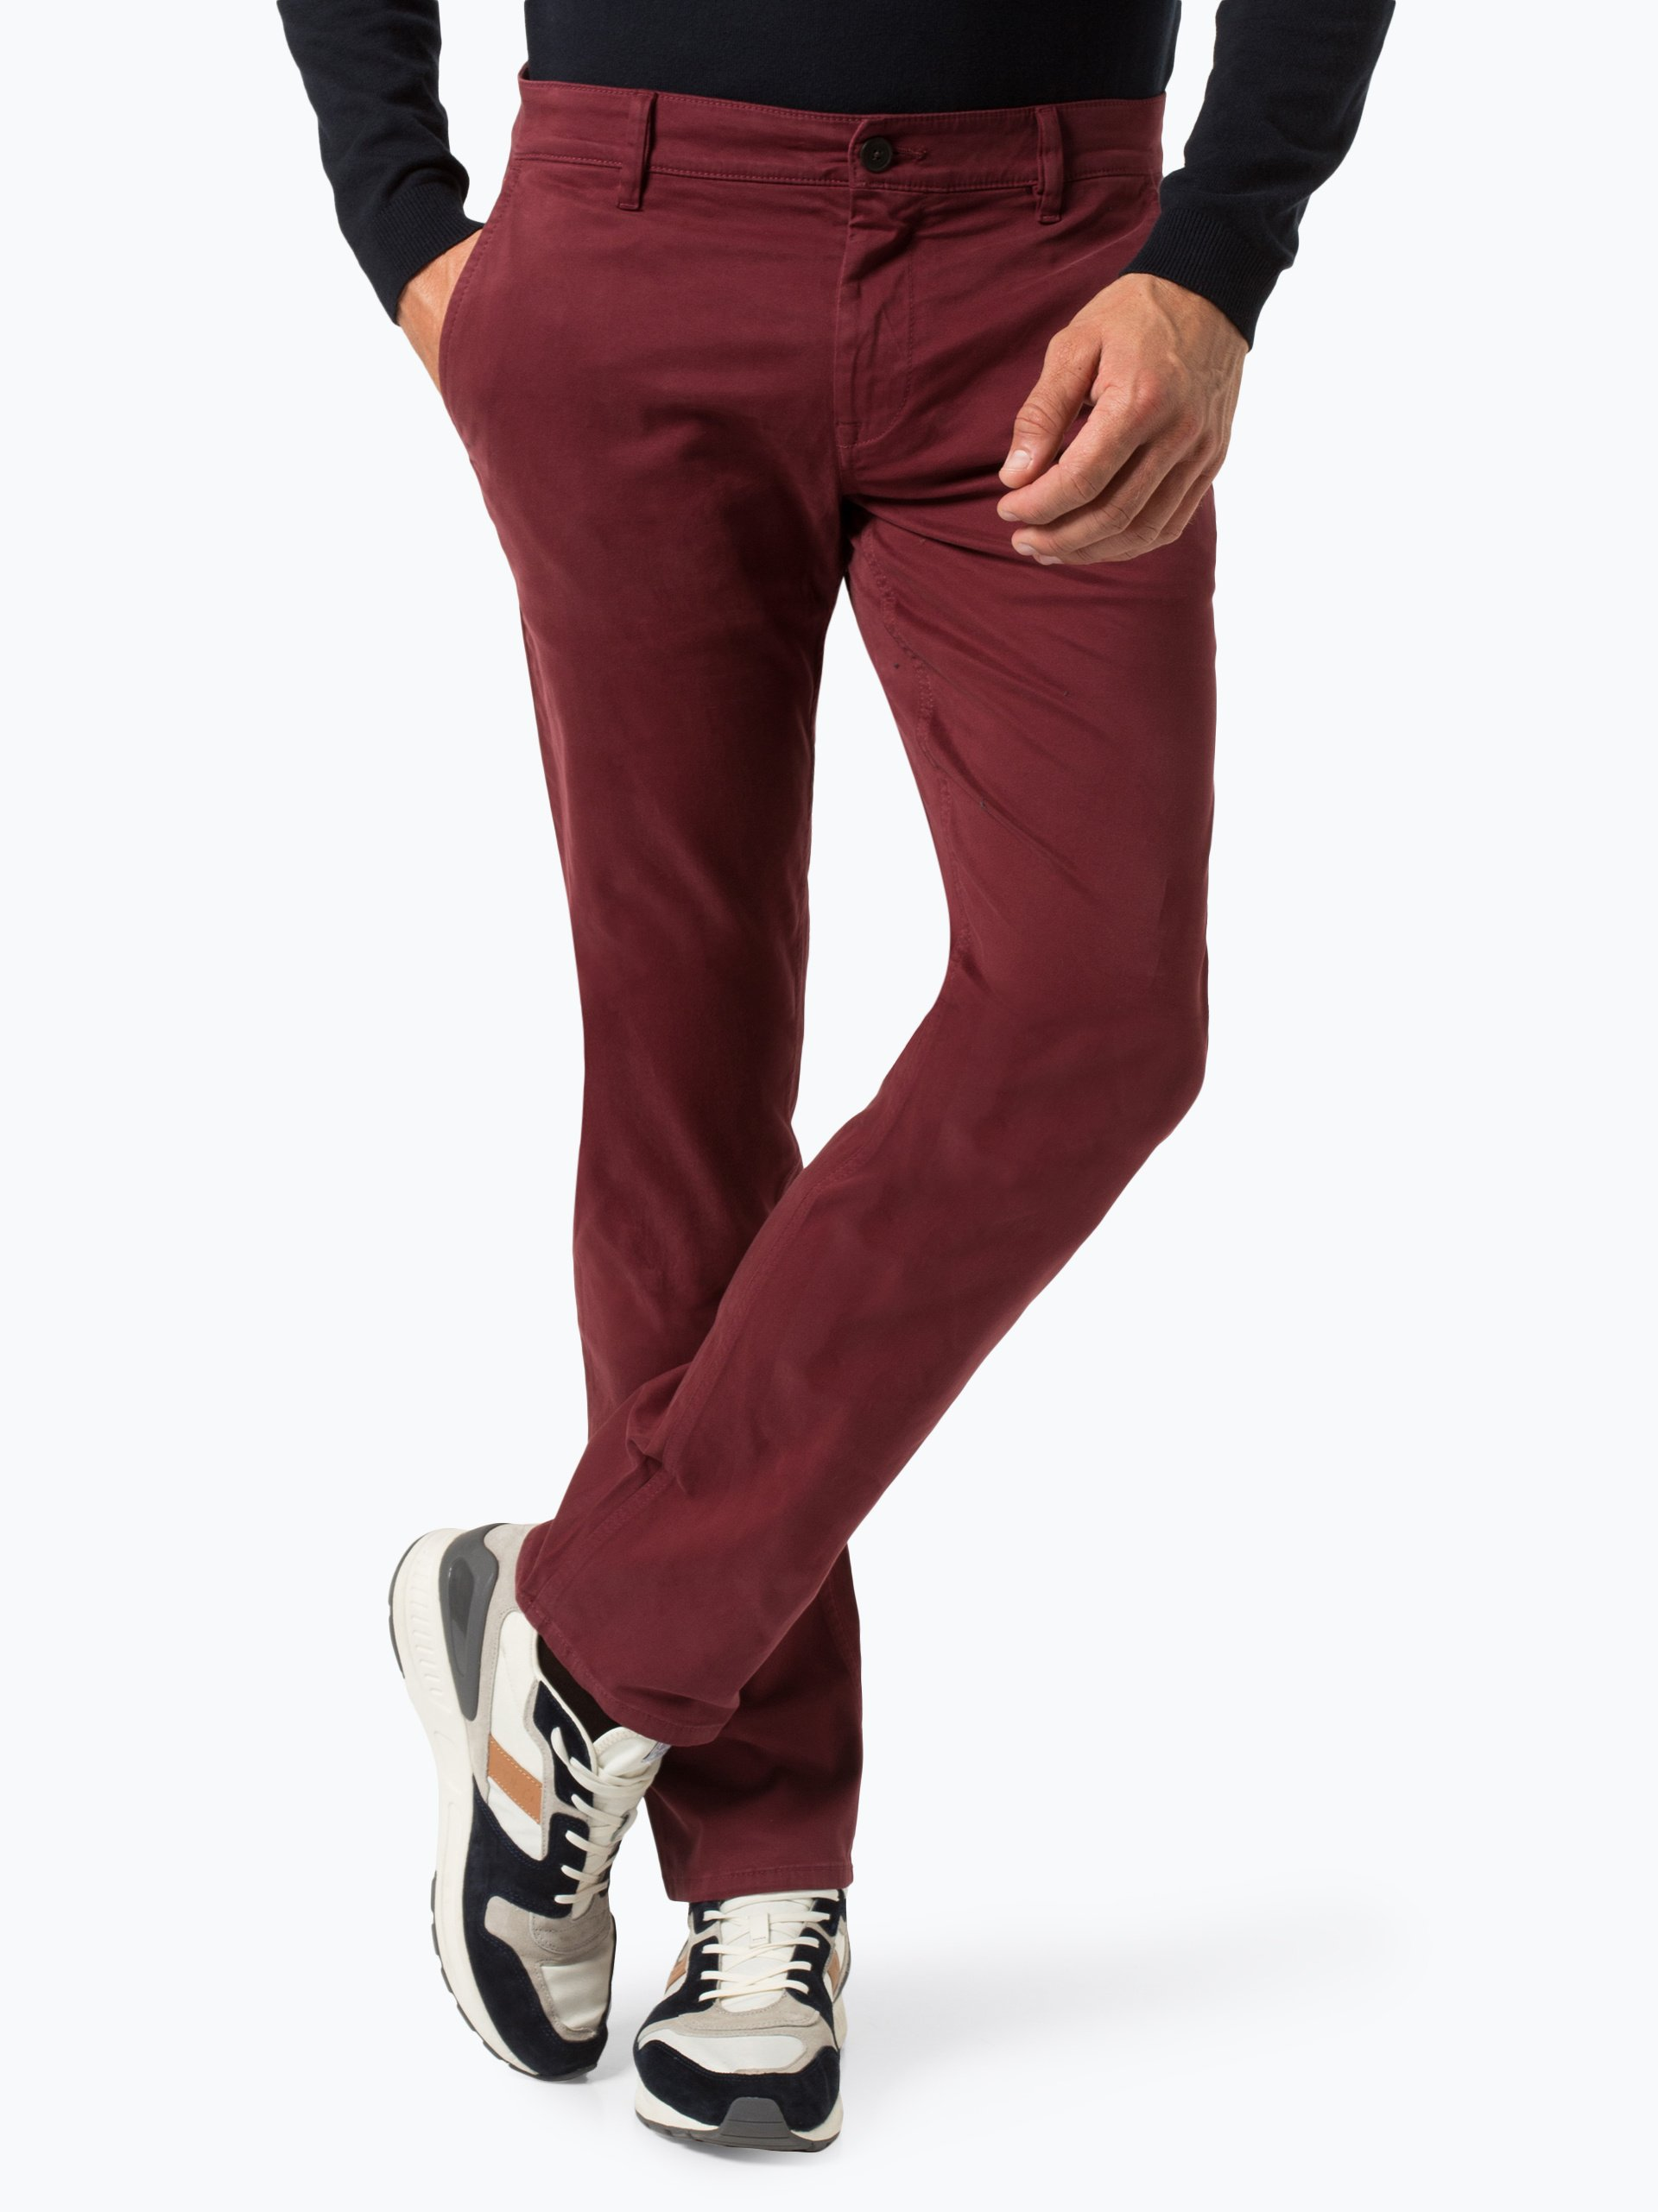 BOSS Casual Spodnie męskie – Schino-Regular D